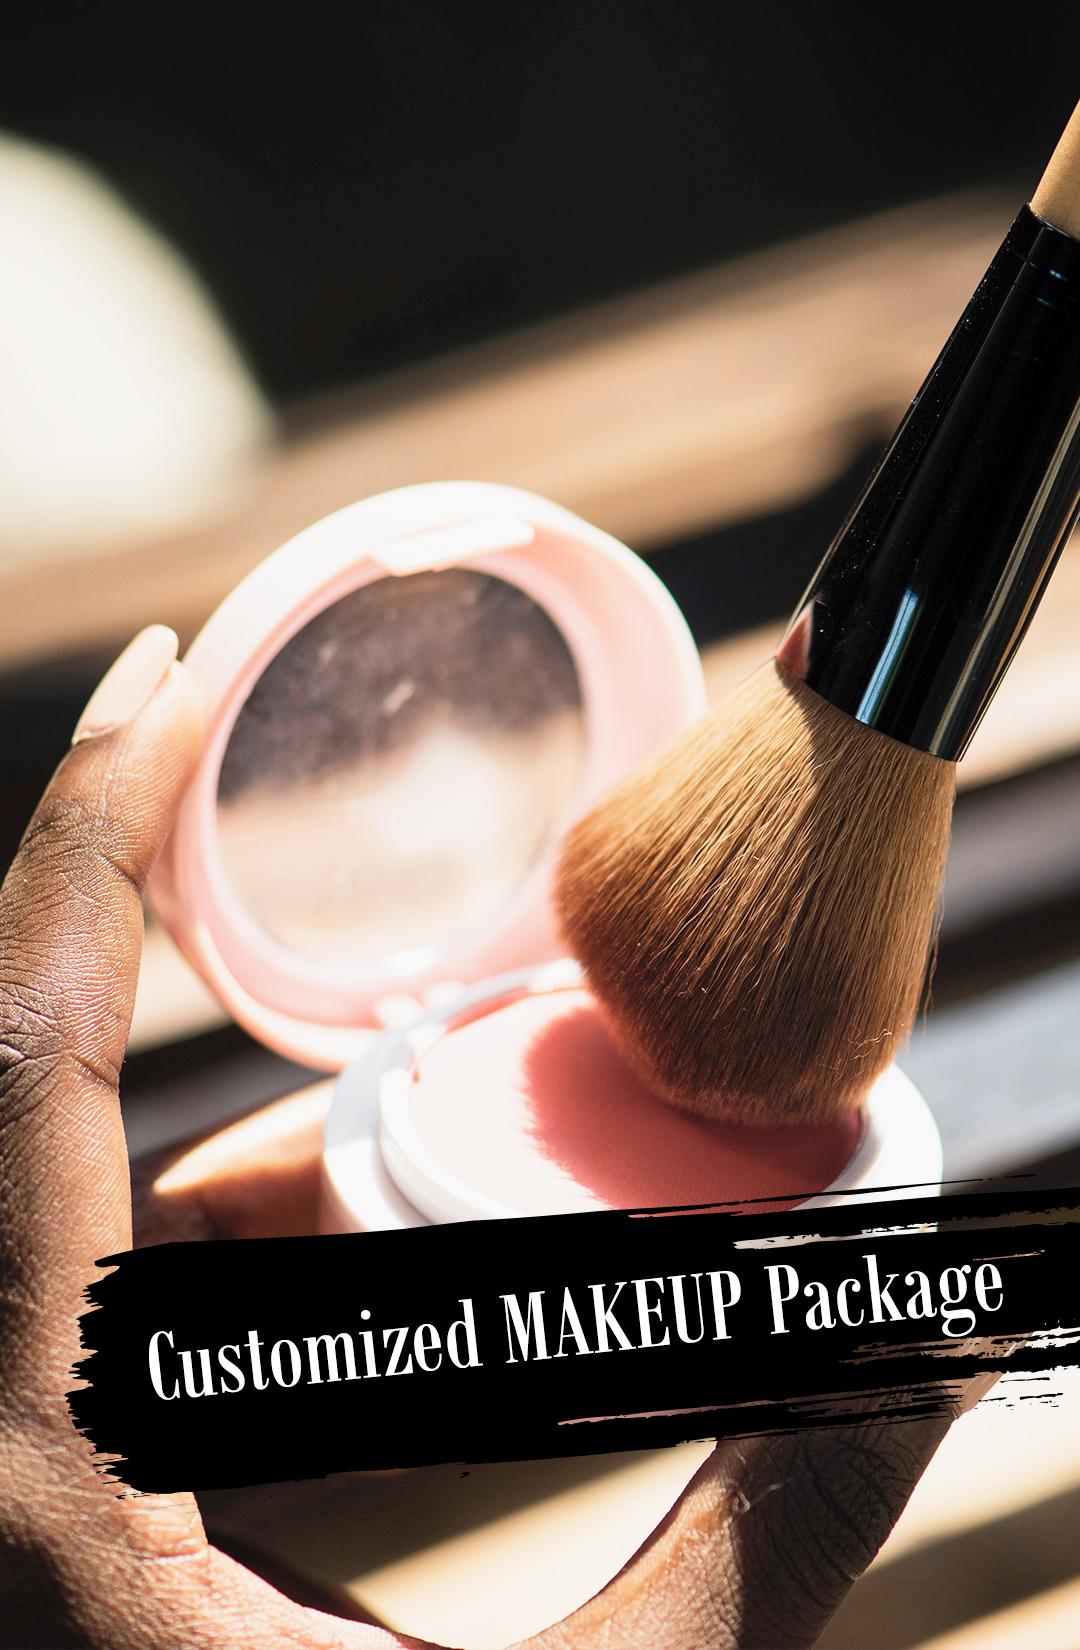 Customized MAKEUP Package.jpg